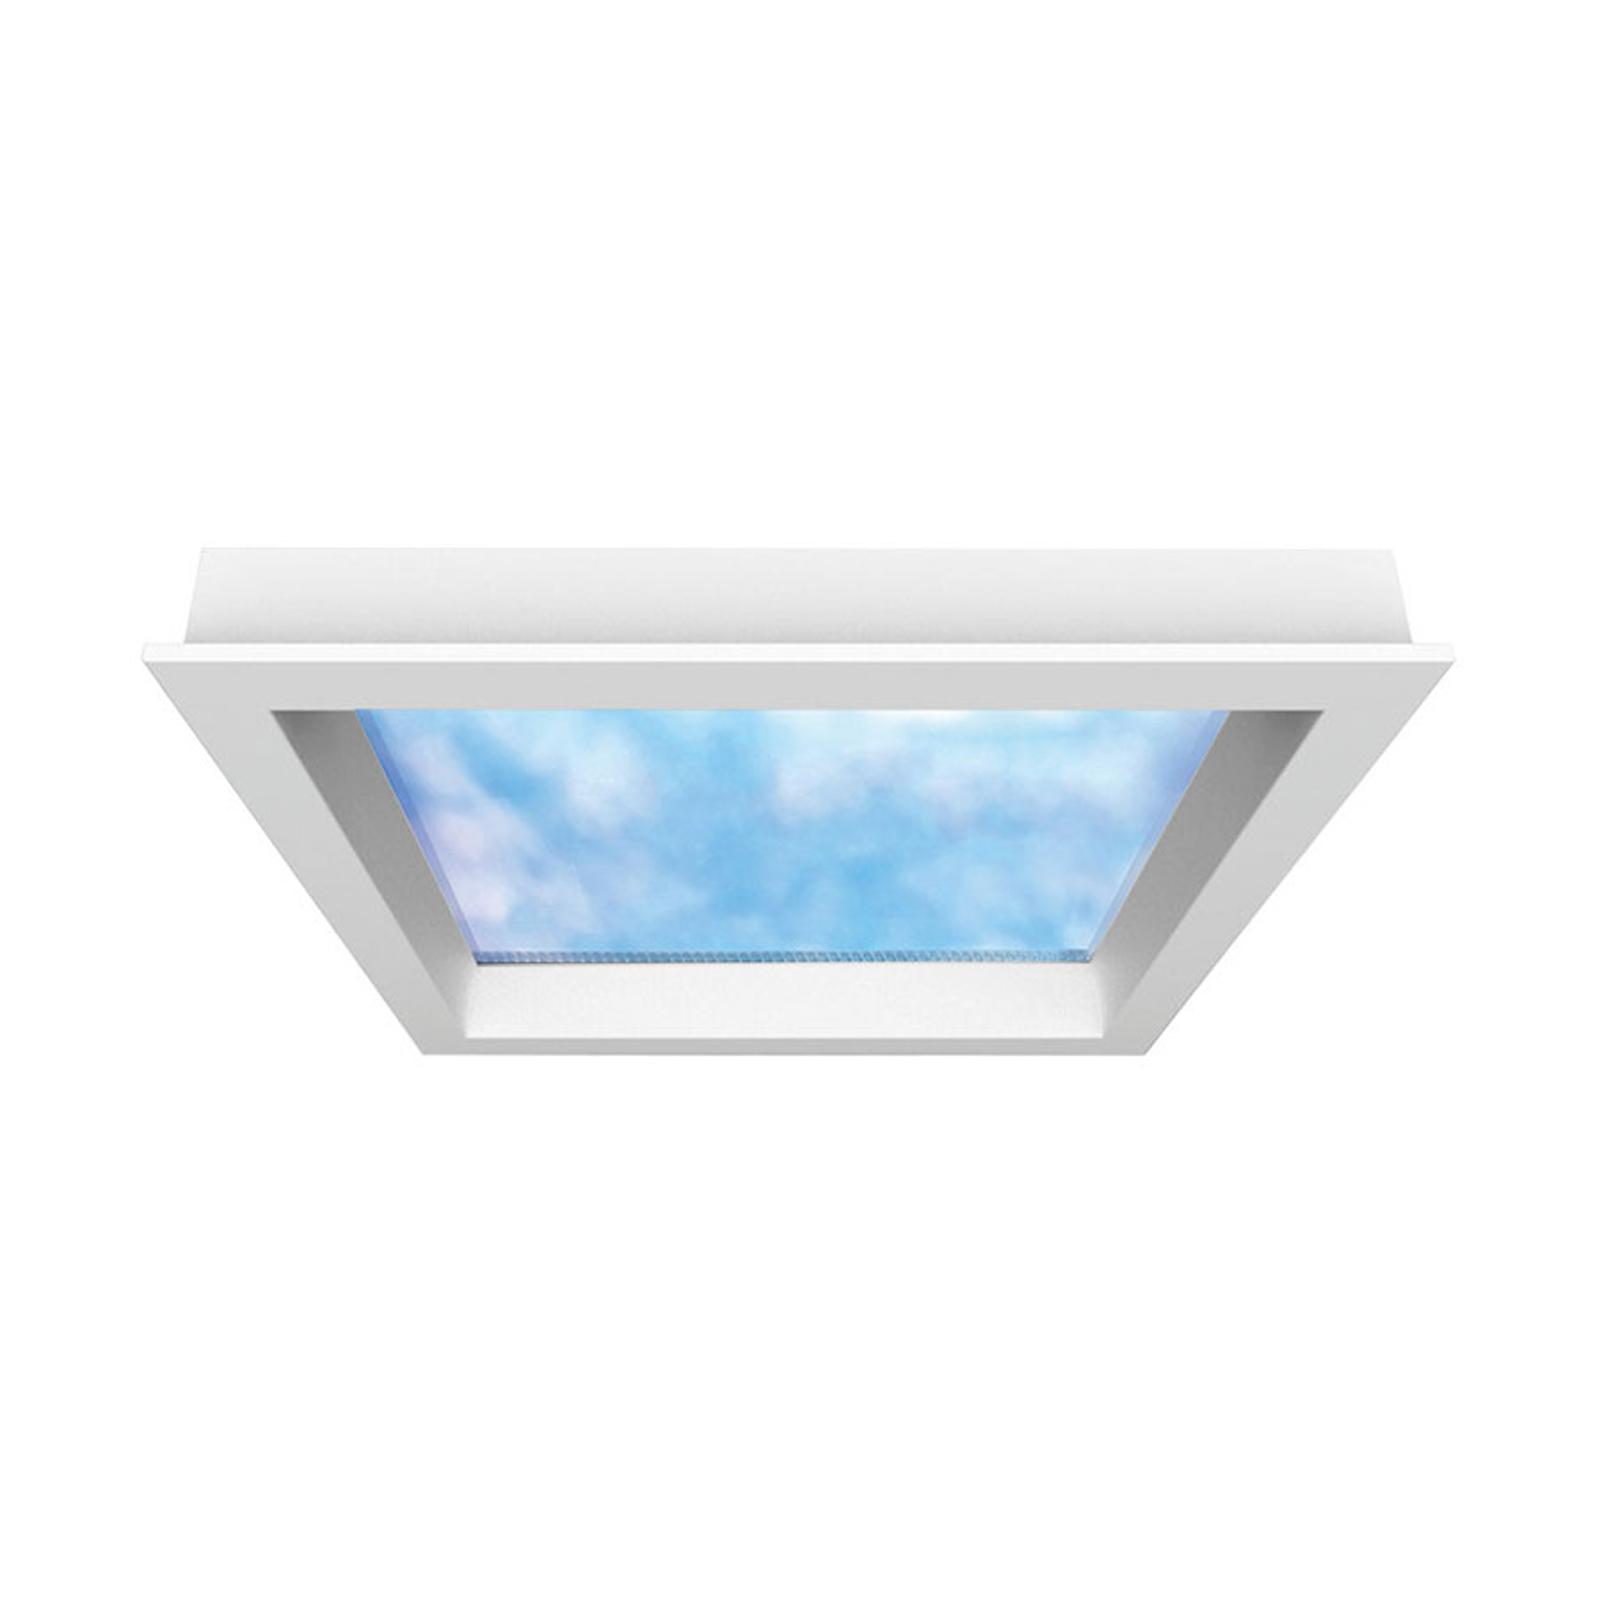 LED-Panel Sky Window 60x60cm mit Einbaurahmen